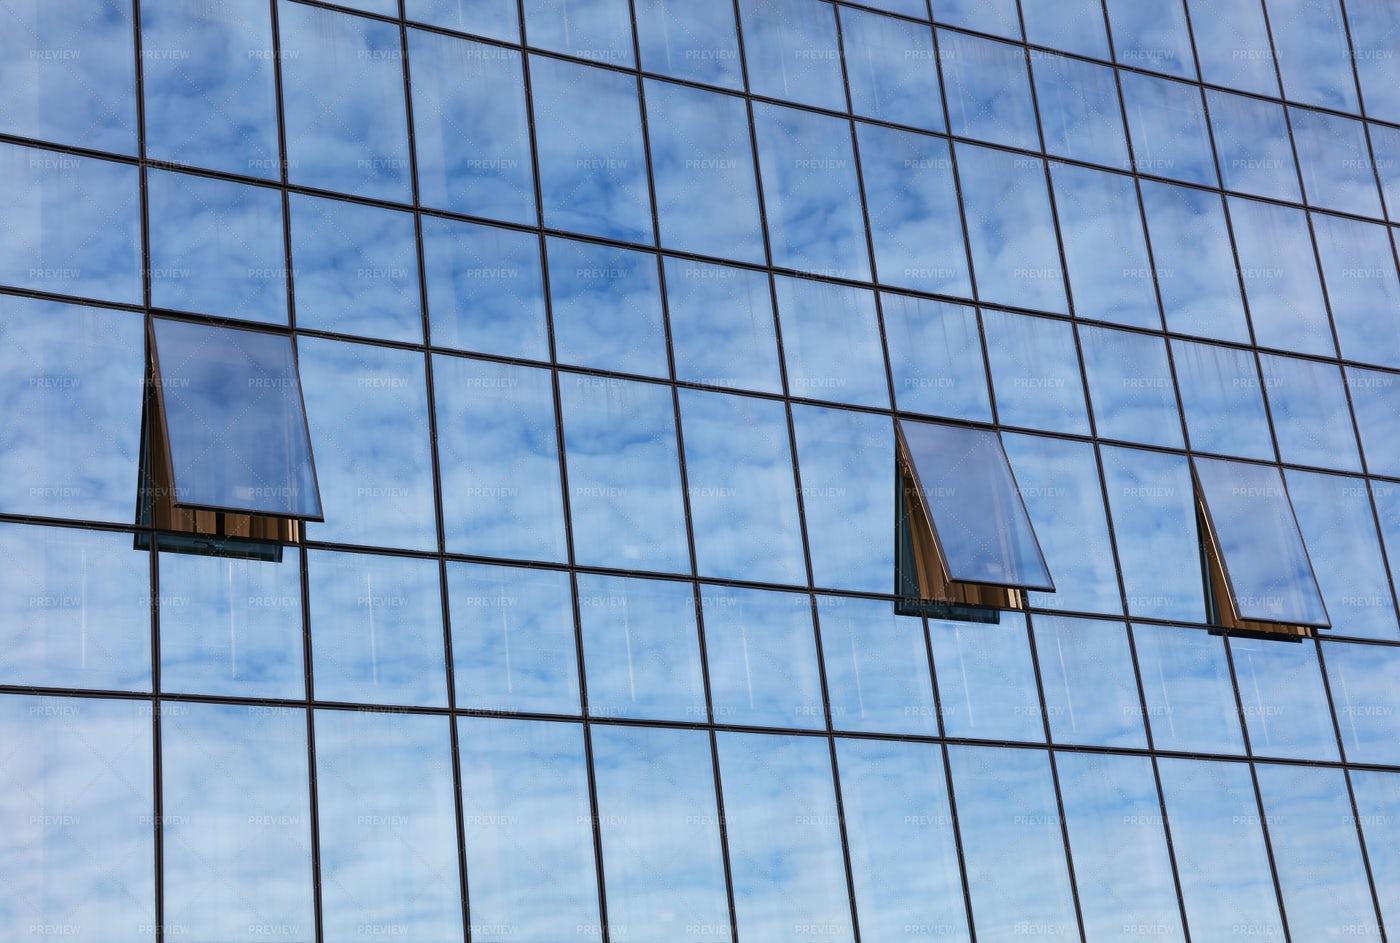 Sky Reflection In Building Windows: Stock Photos